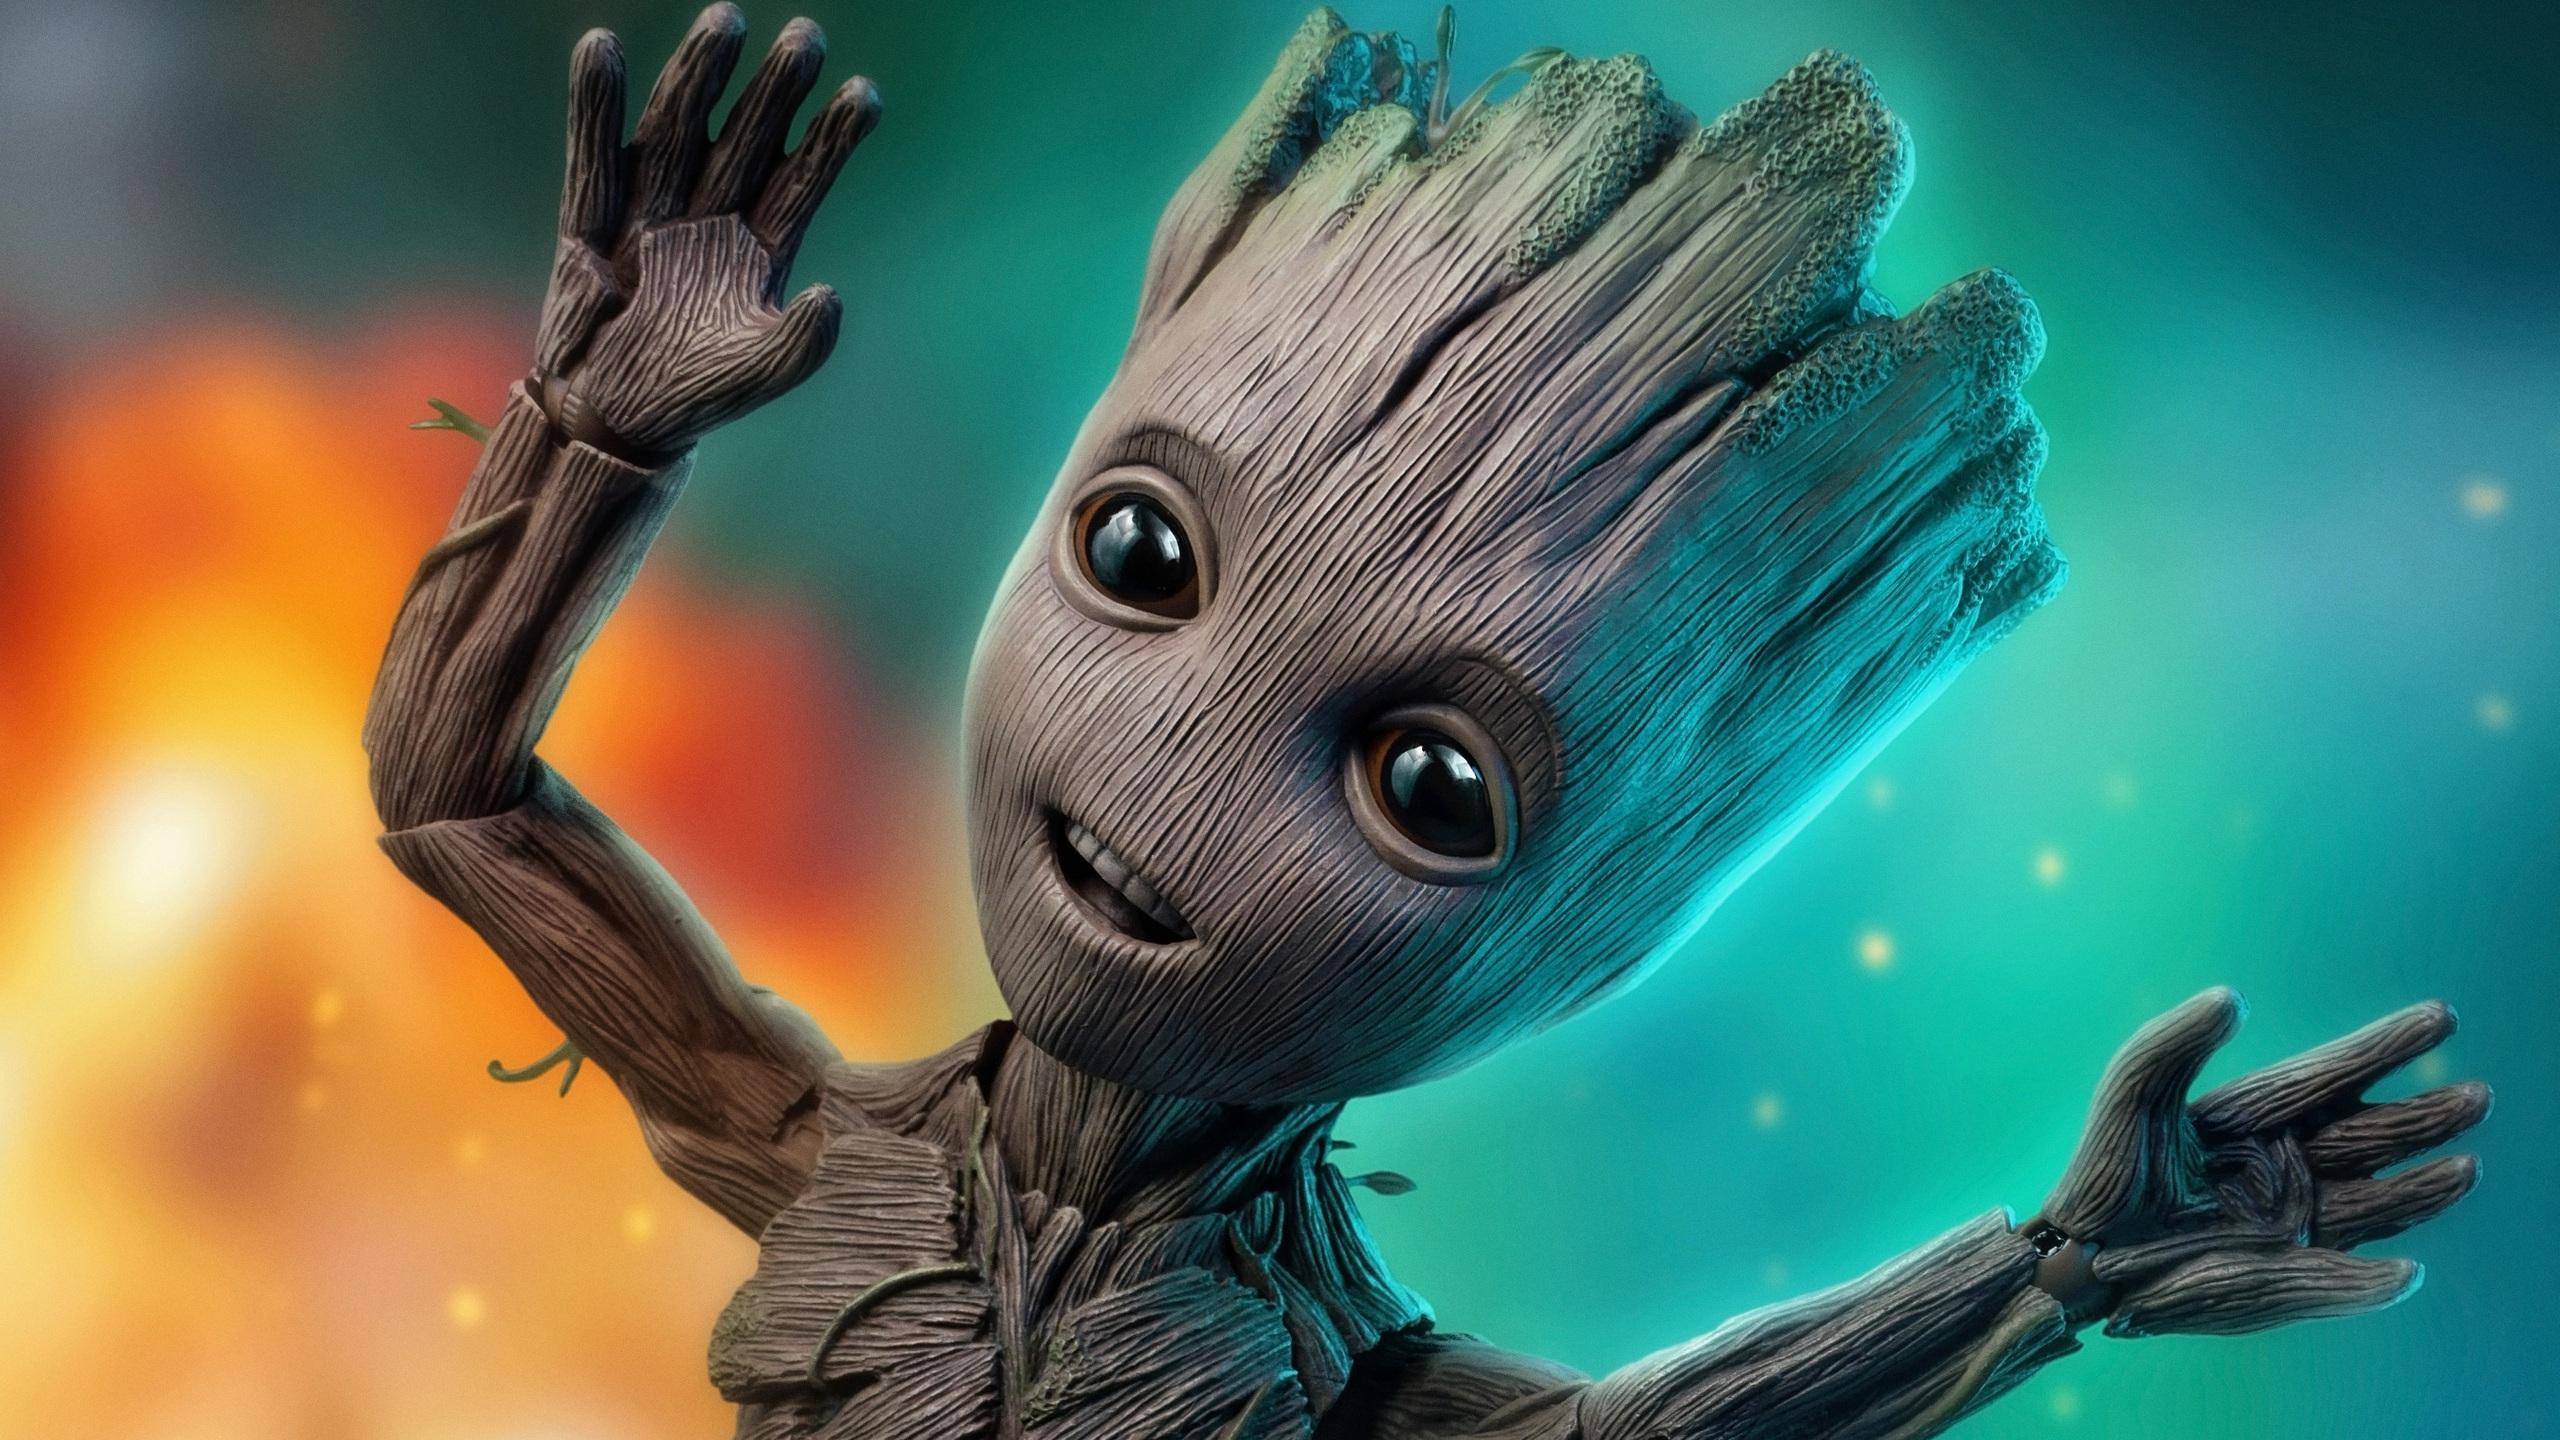 2560x1440 Baby Groot 4k 2018 1440P Resolution HD 4k ...